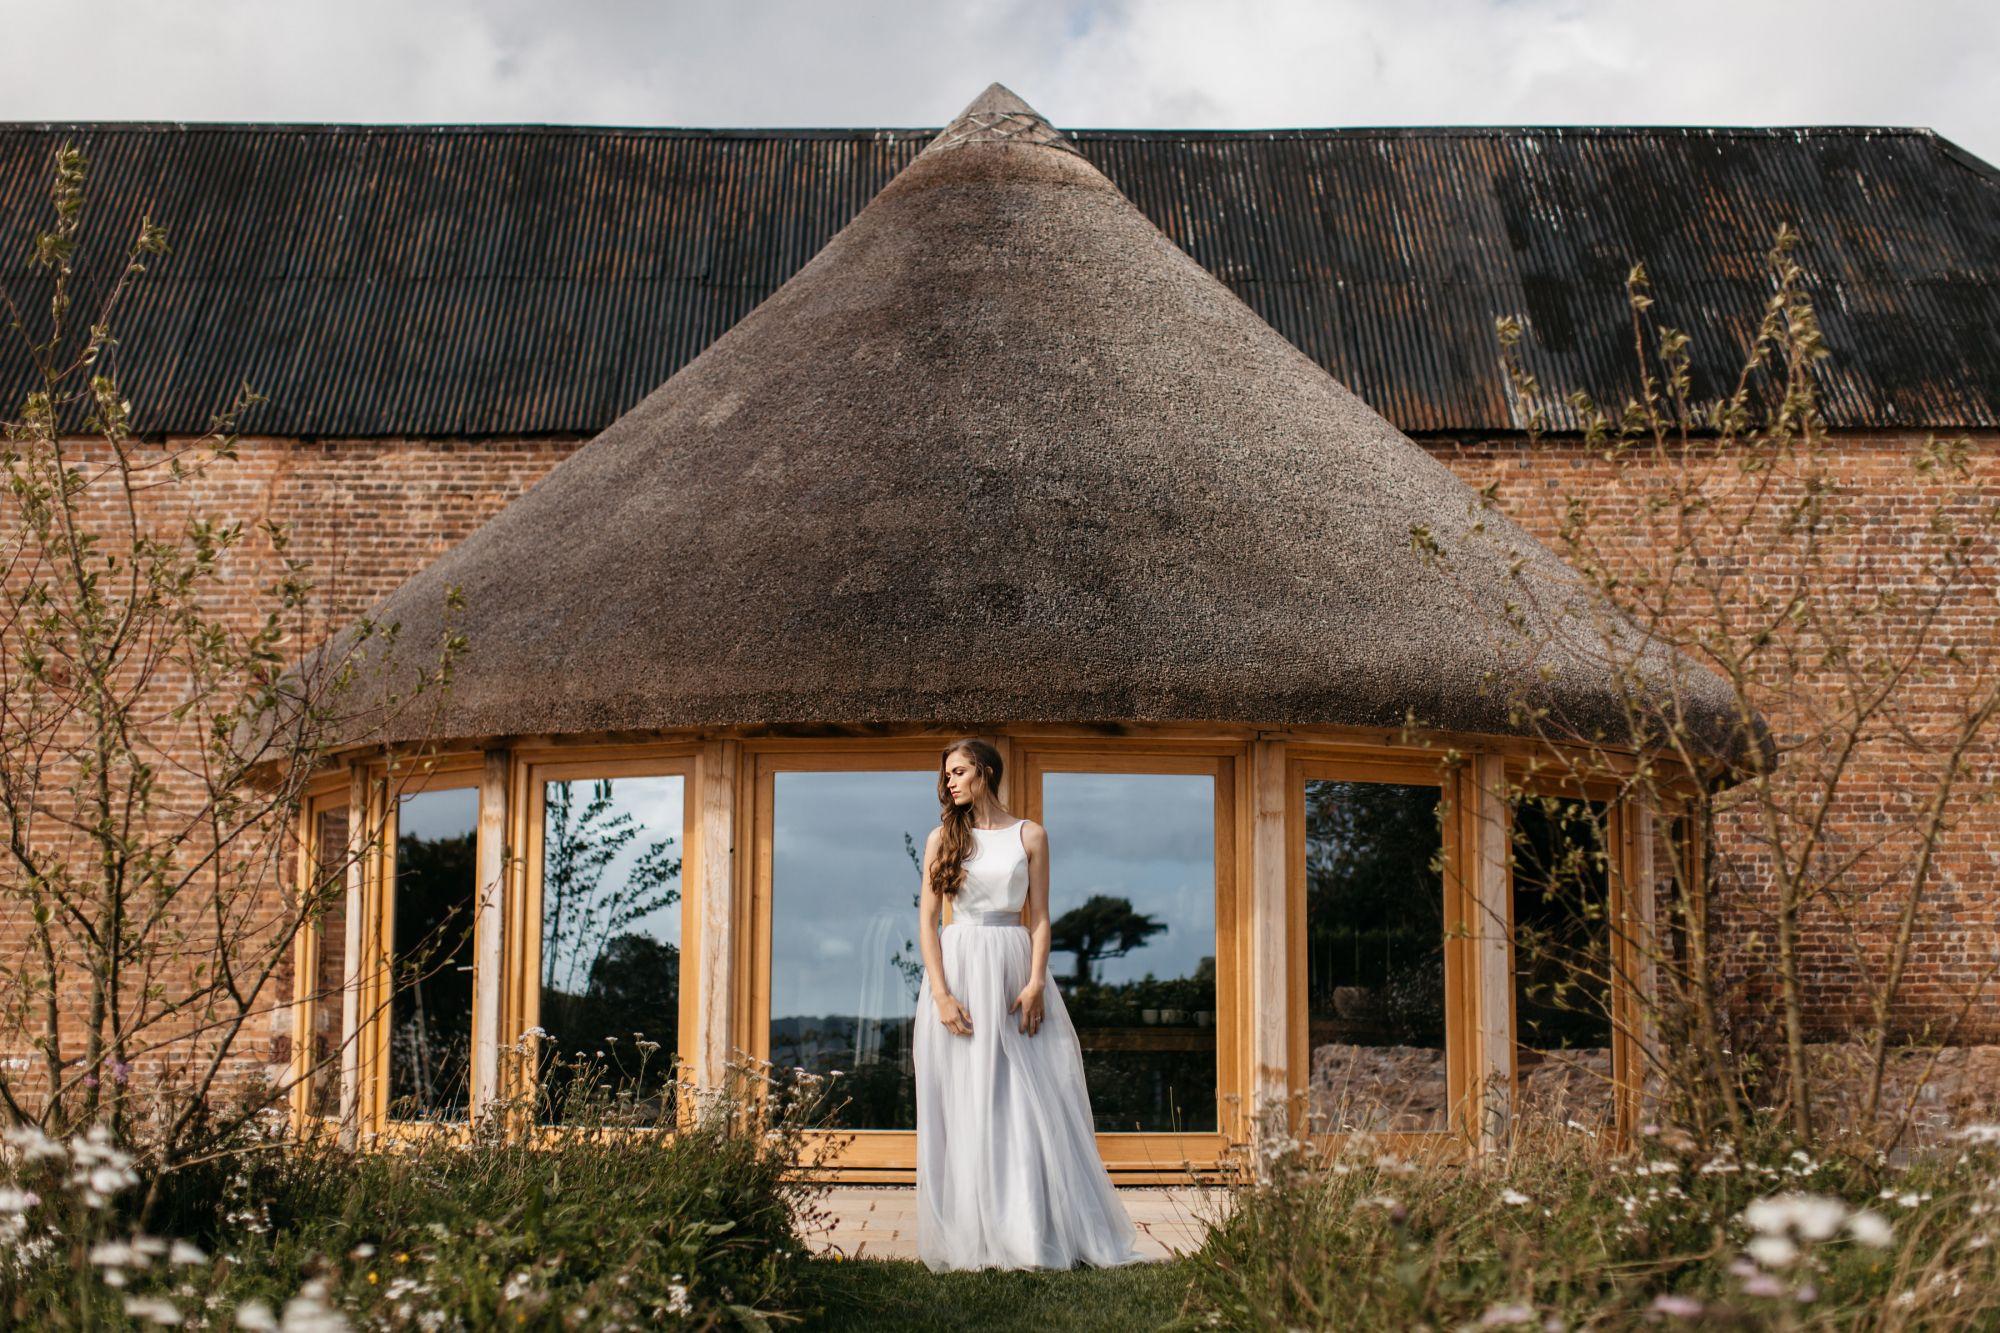 Brickhouse Vineyard Romantic Idyllic Wedding Venue In Devon